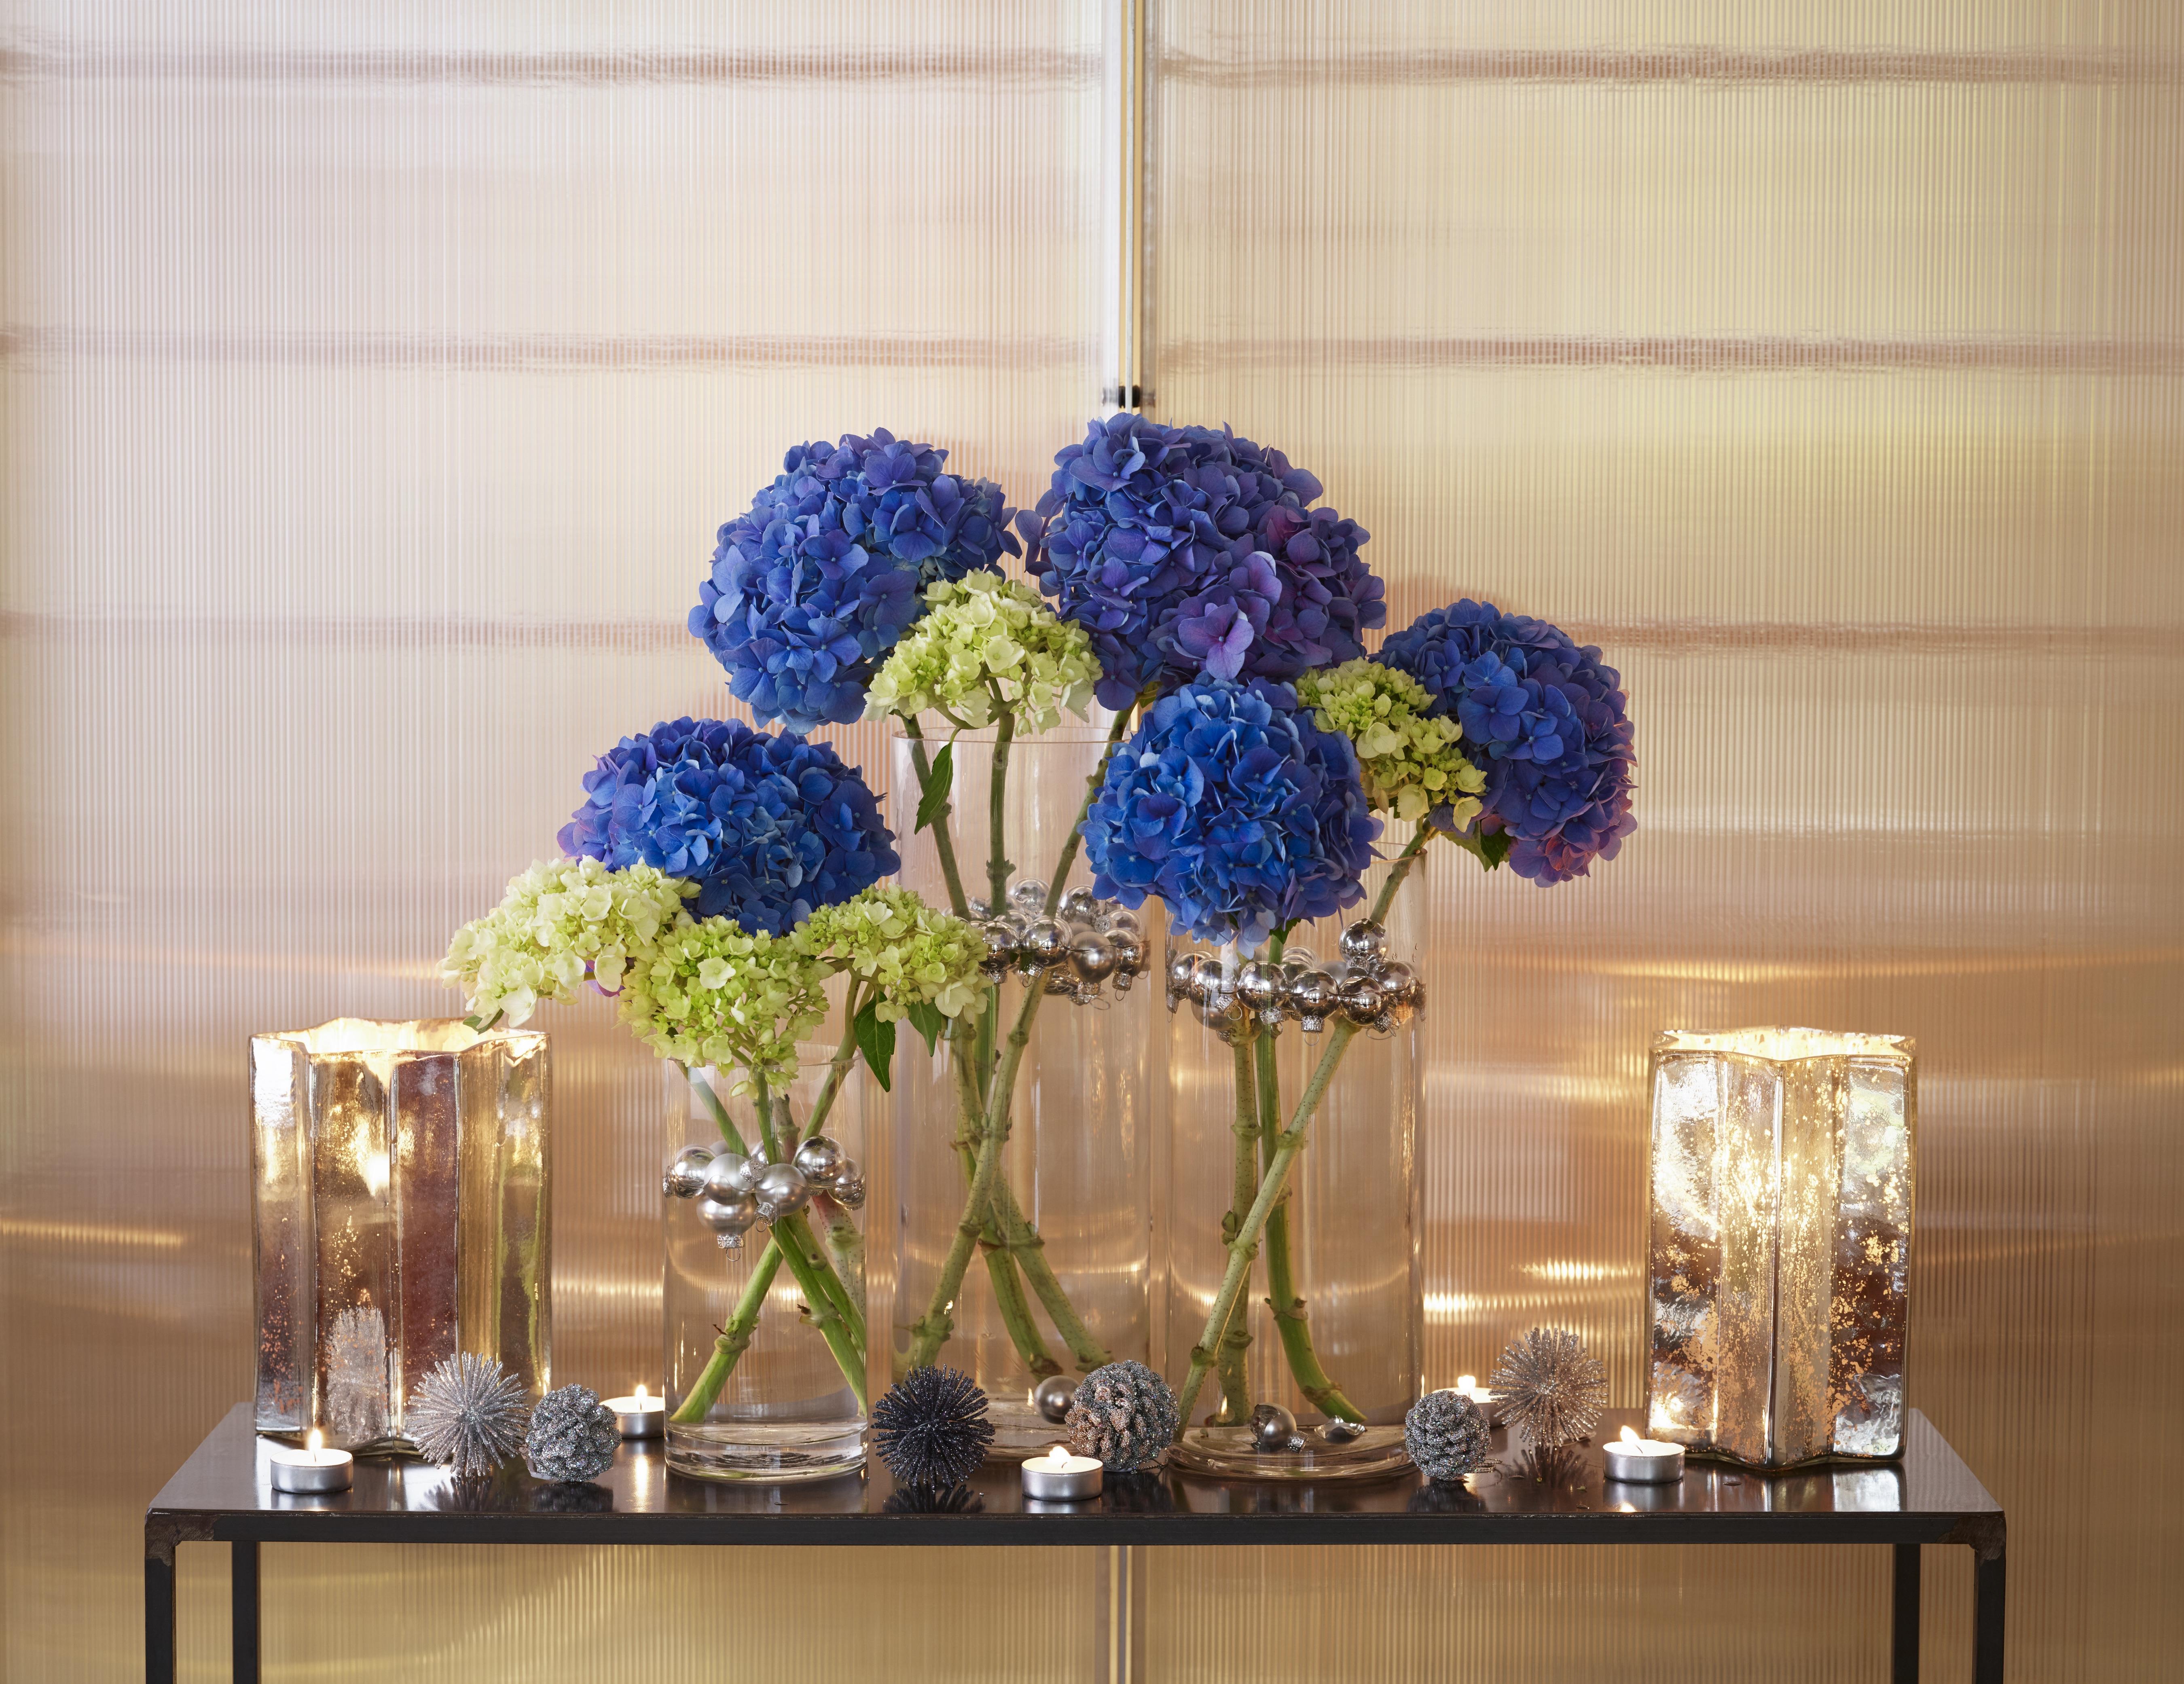 Hanukkah ornaments for a tree - 2015 11 30 1448903204 3165402 Hanukkah_flowers Jpg